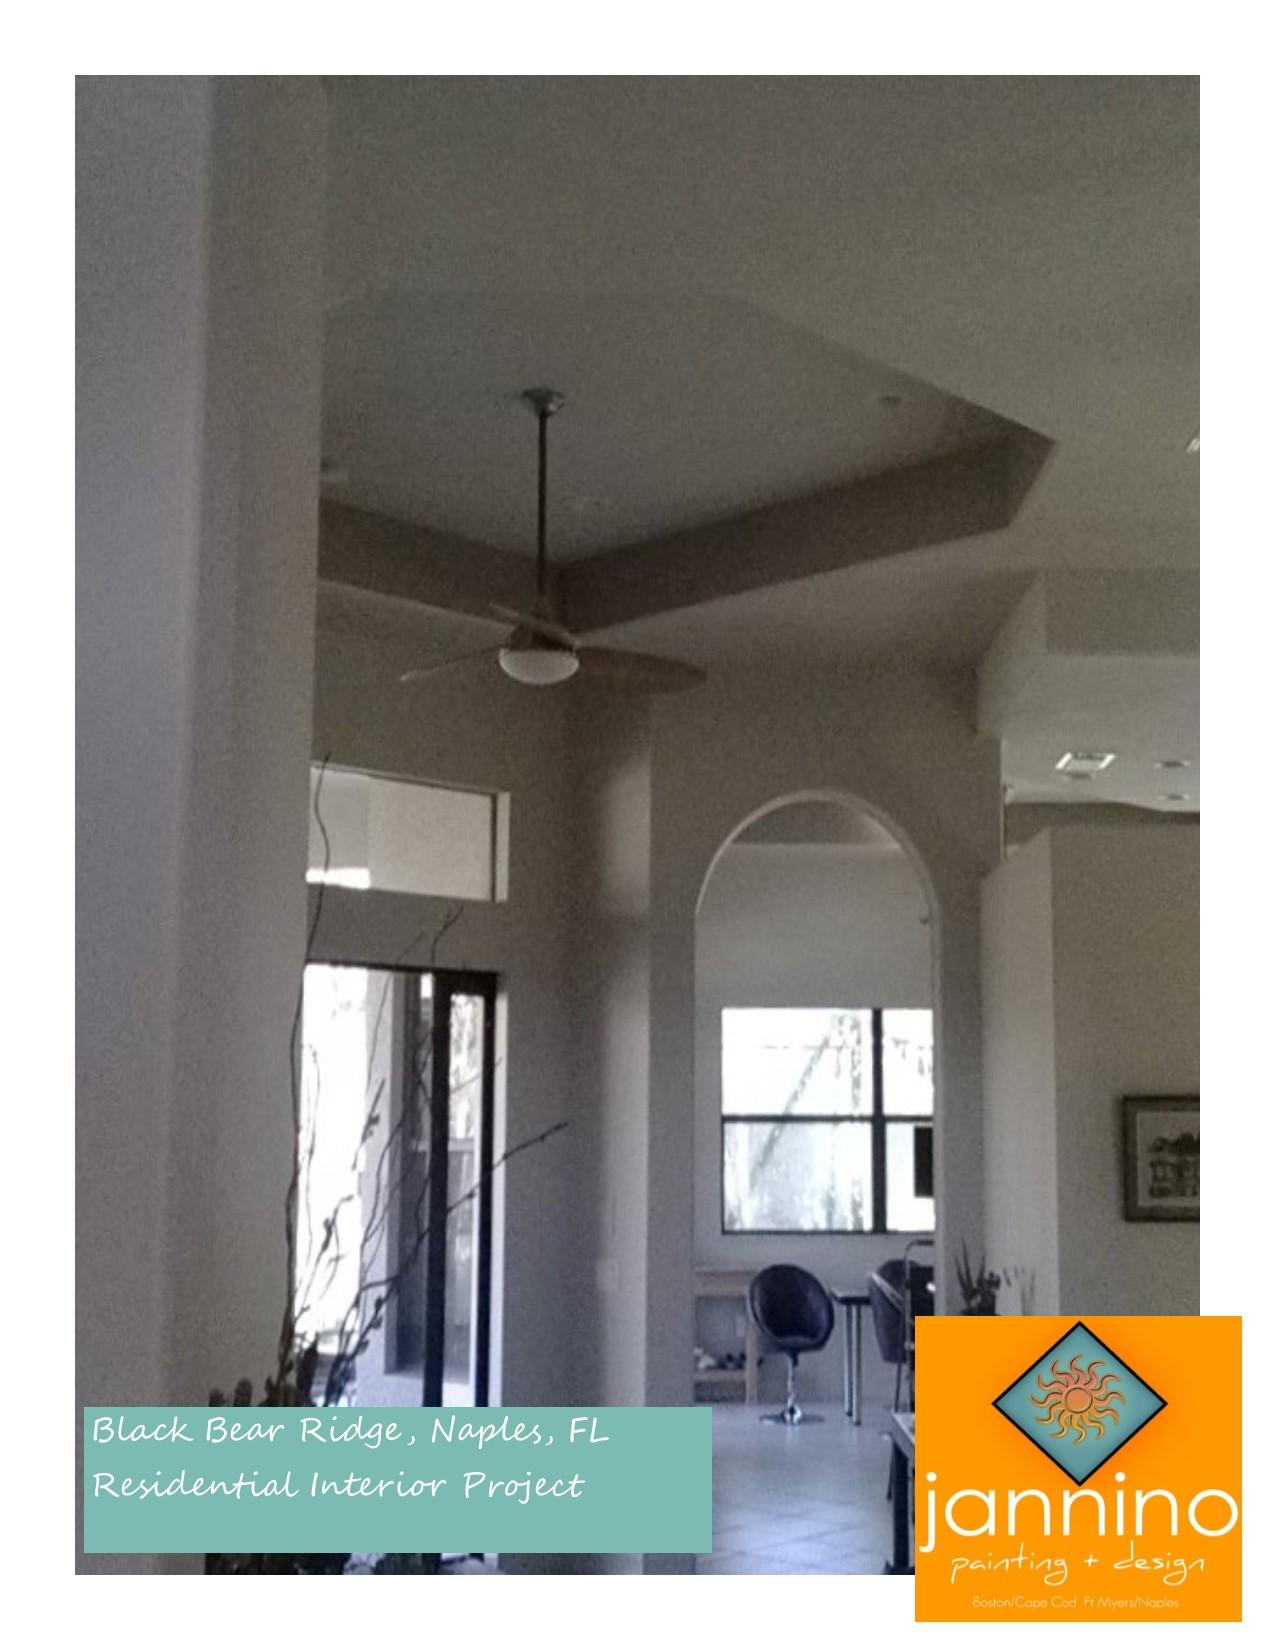 Jannino Painting Design Interior Residential Painting